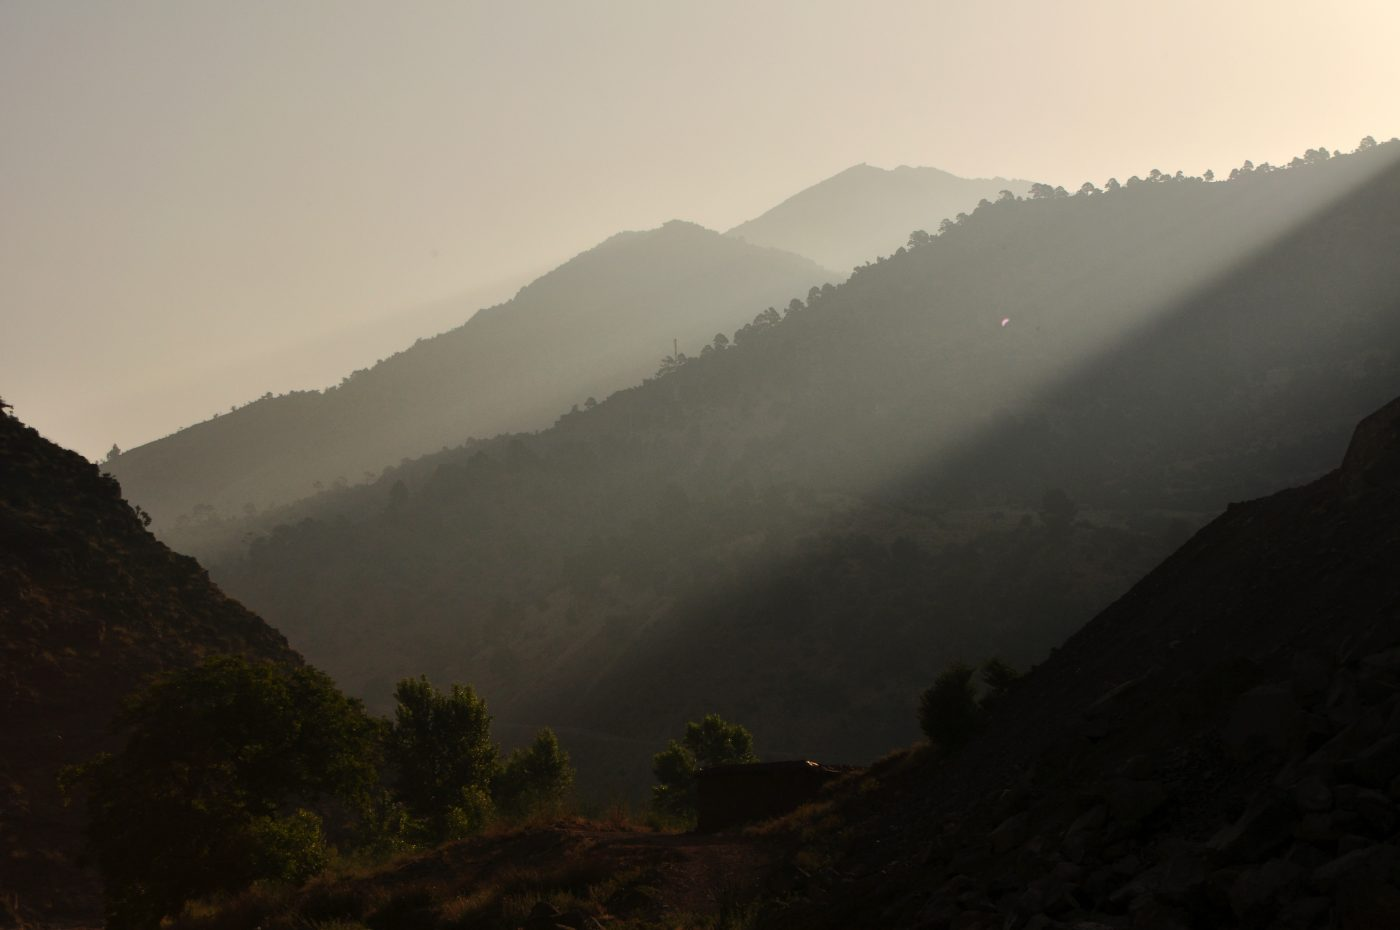 The sun rises over the mountain